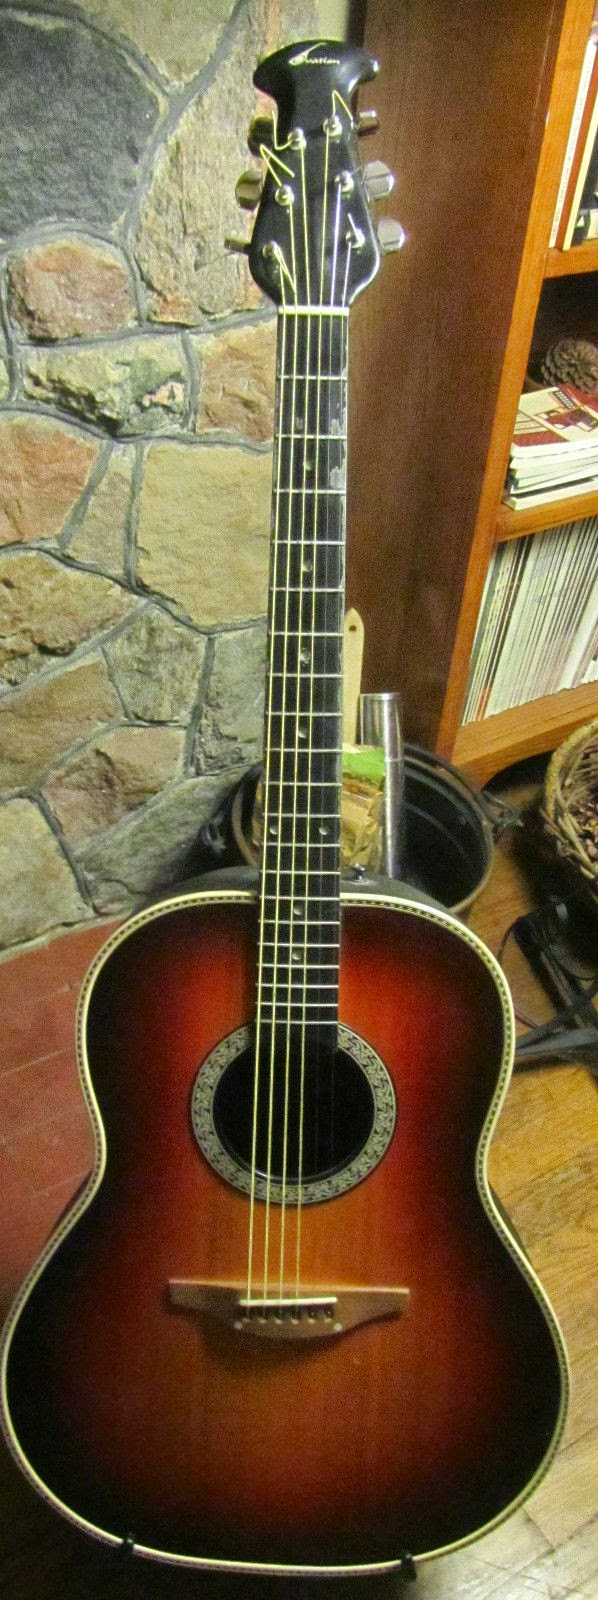 guitars | Terry Malloy's Pigeon Coop